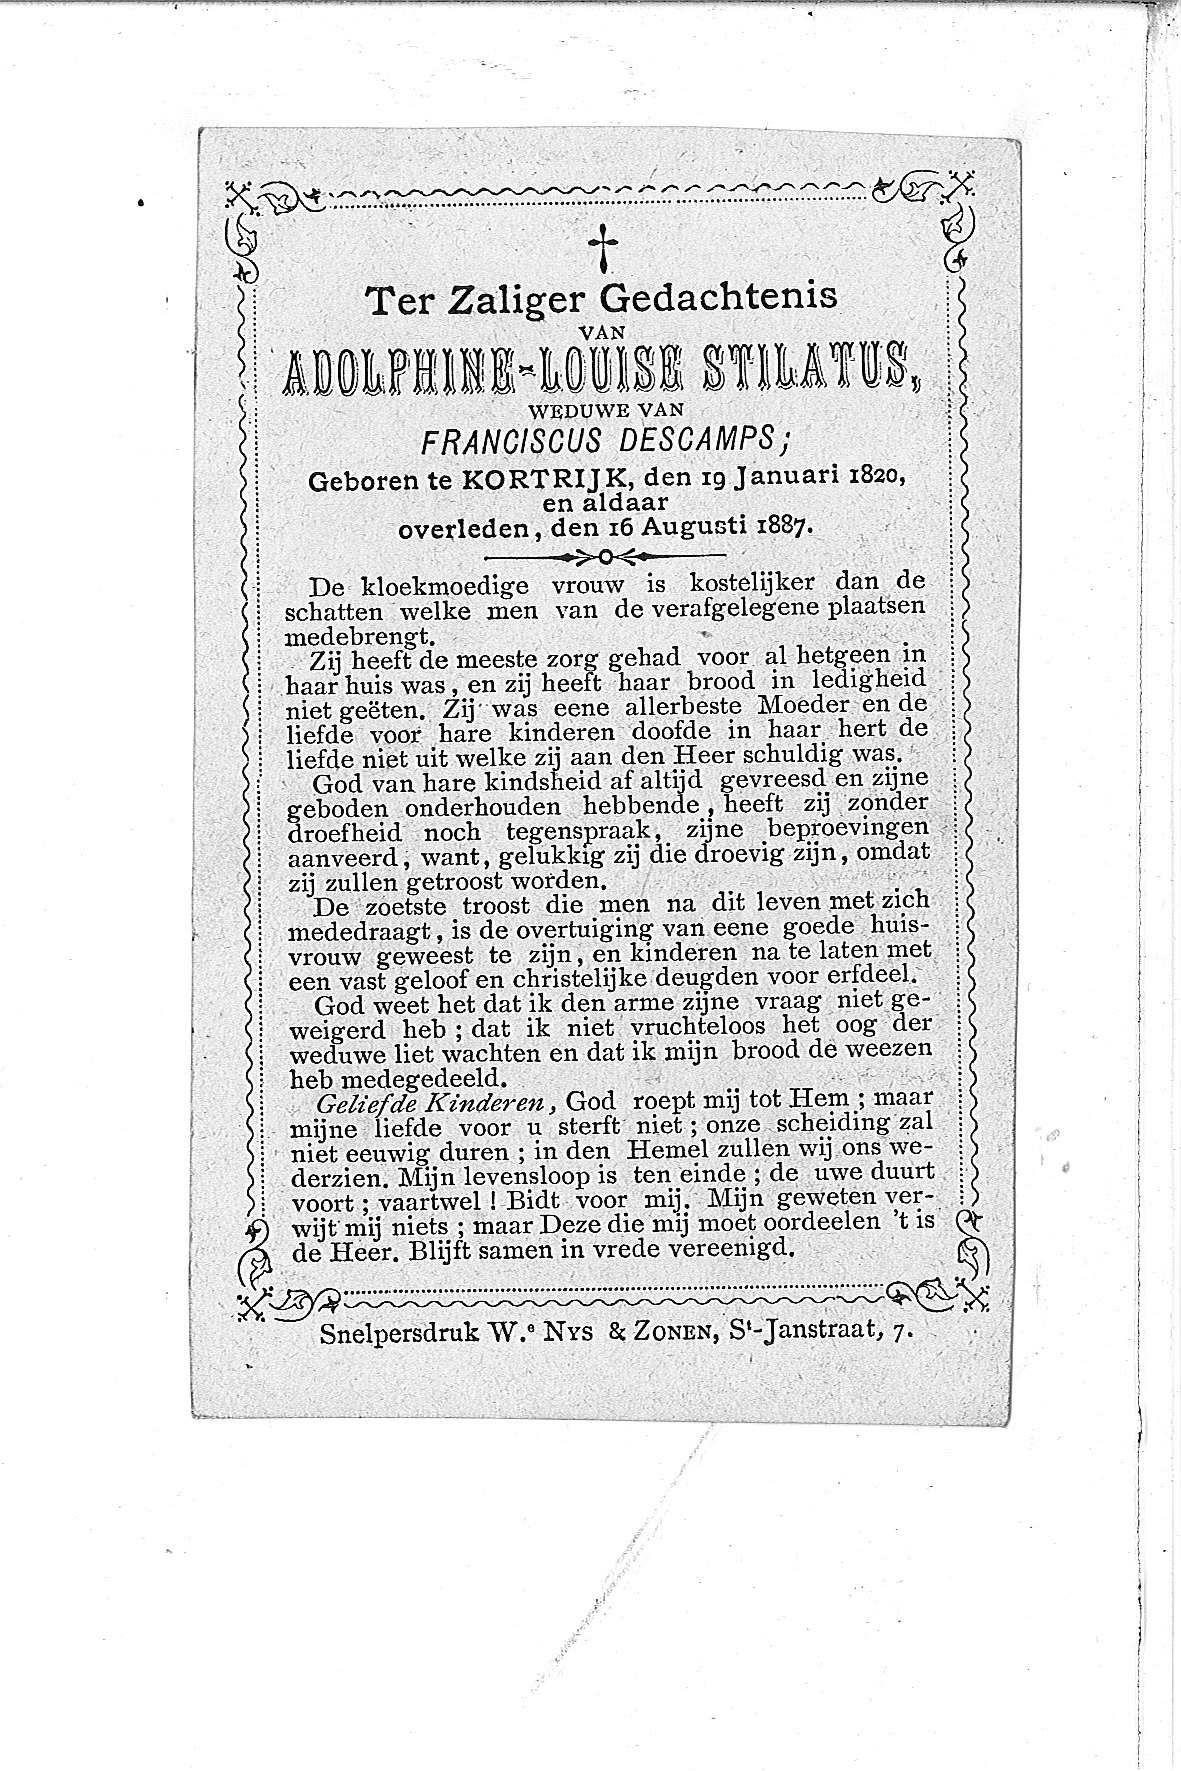 Adolphine-Louise(1887)20100622164114_00029.jpg